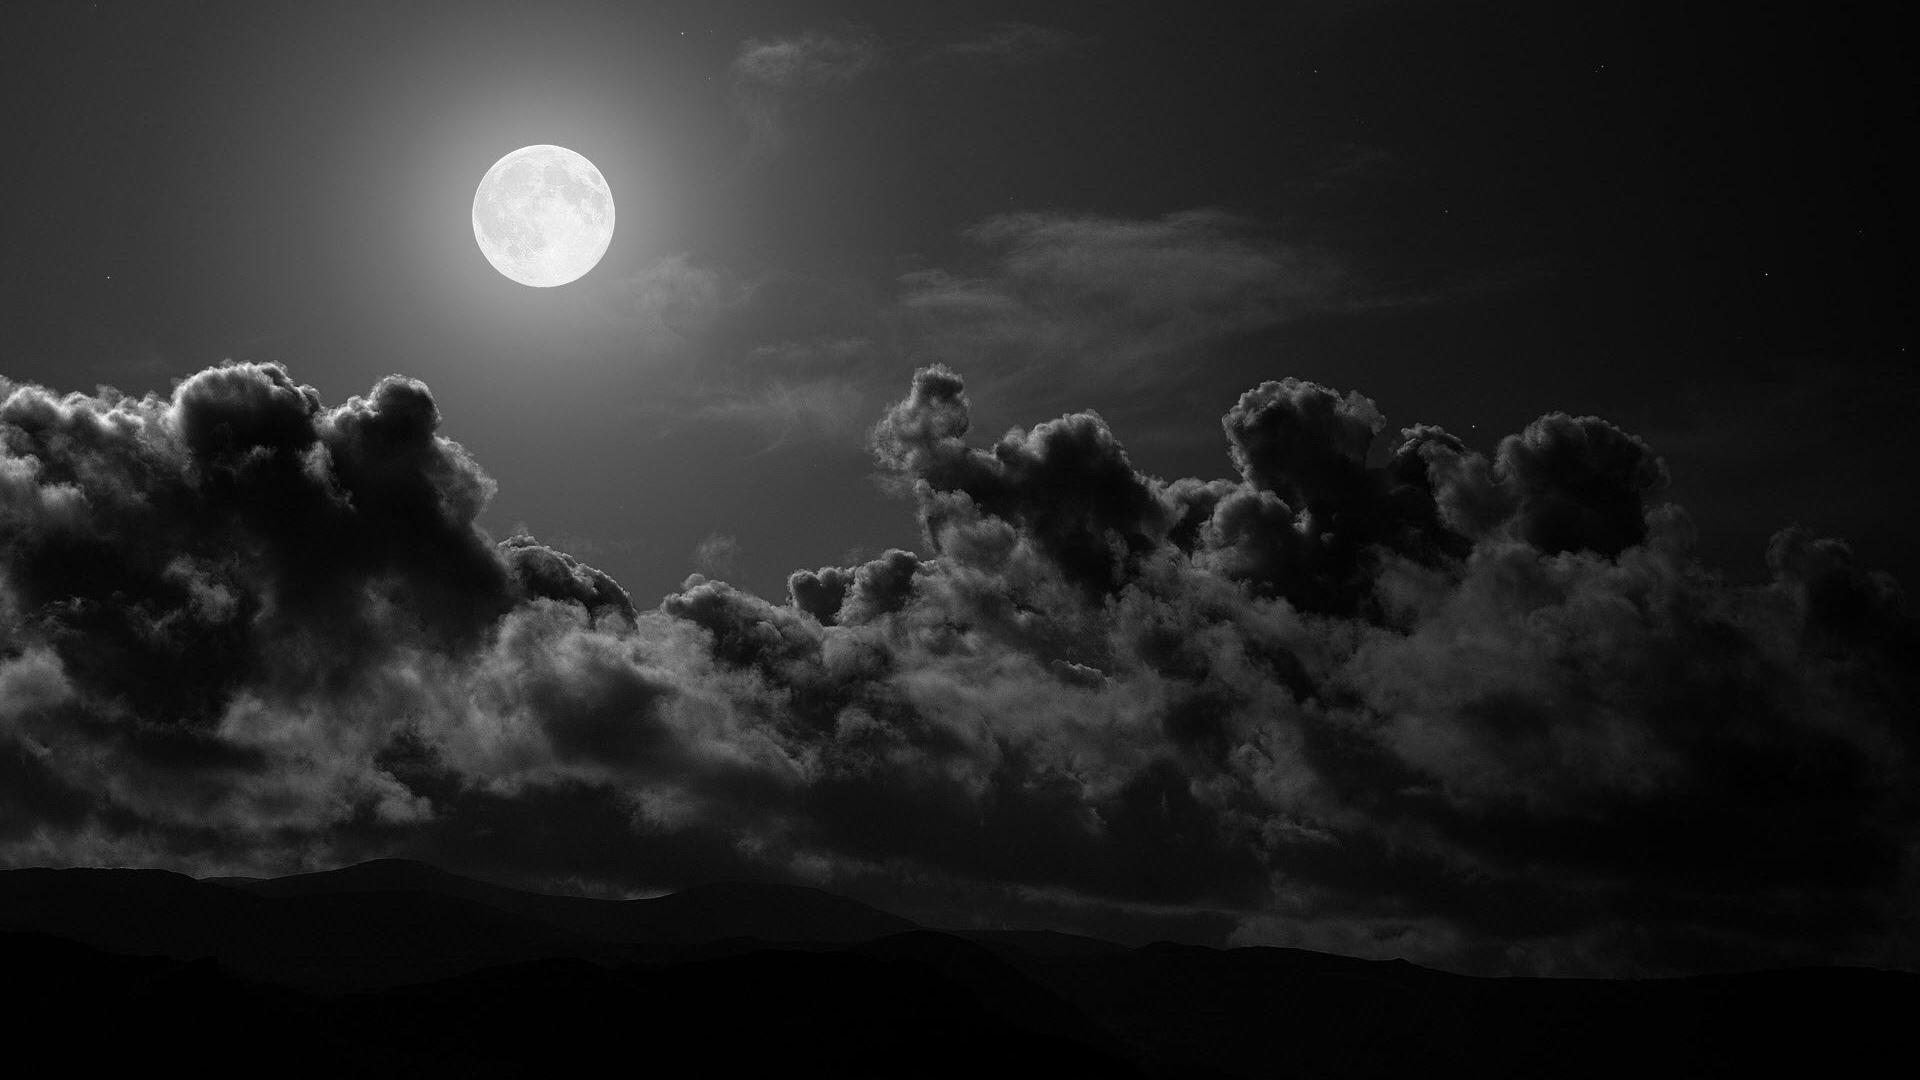 Free Download 1920x1080 Moon Light Black Desktop Pc And Mac